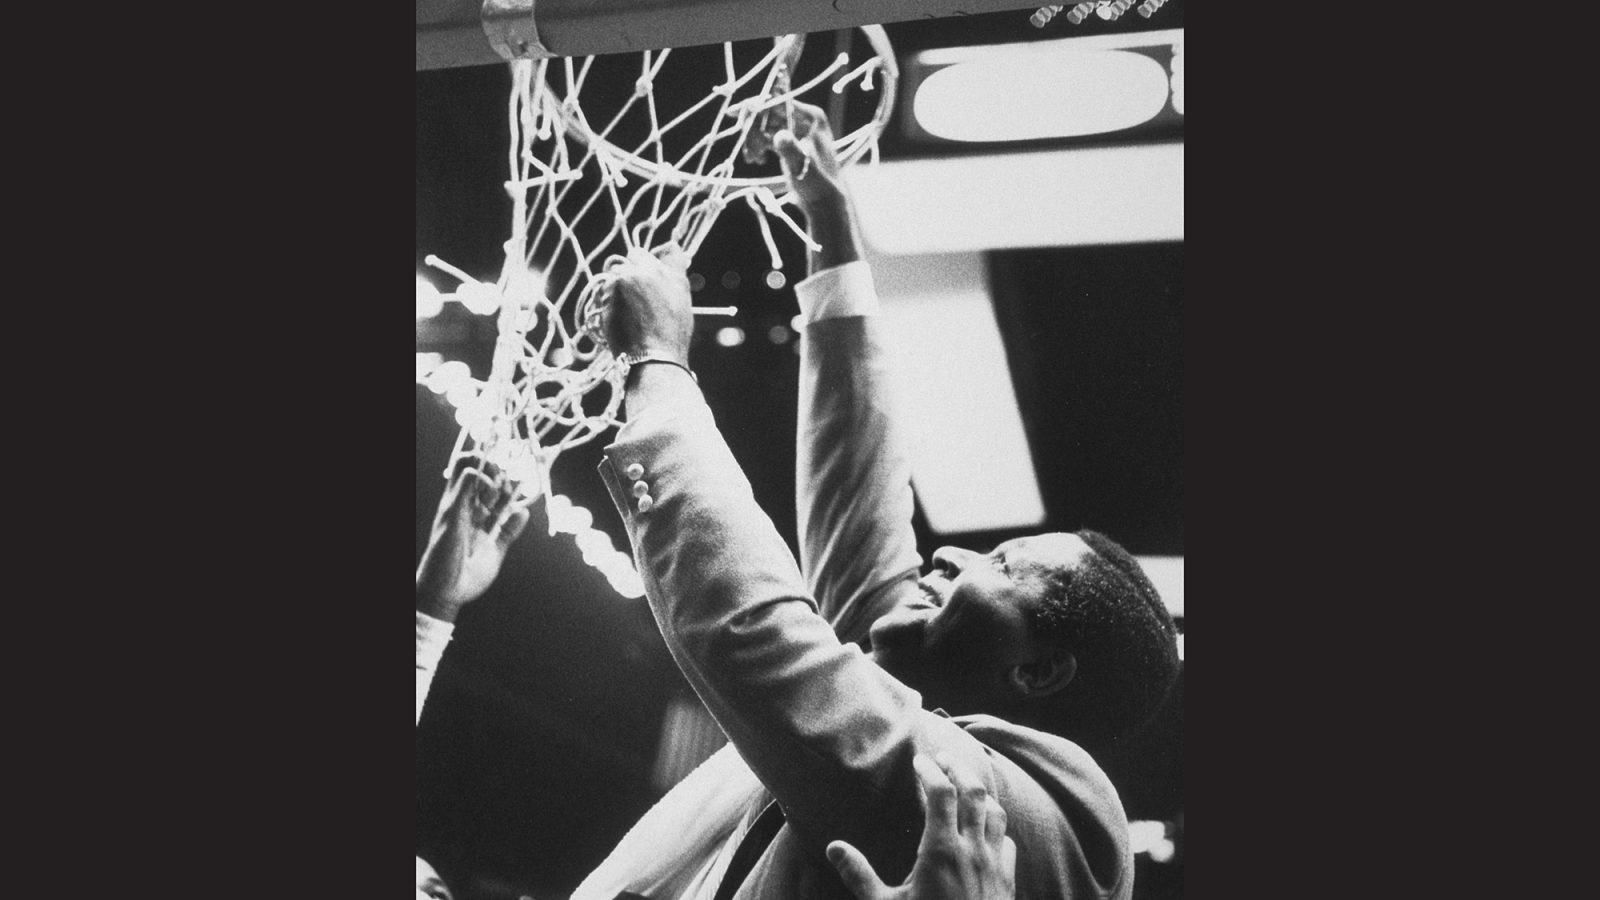 John Thompson Jr. cuts the basket ball net after victory